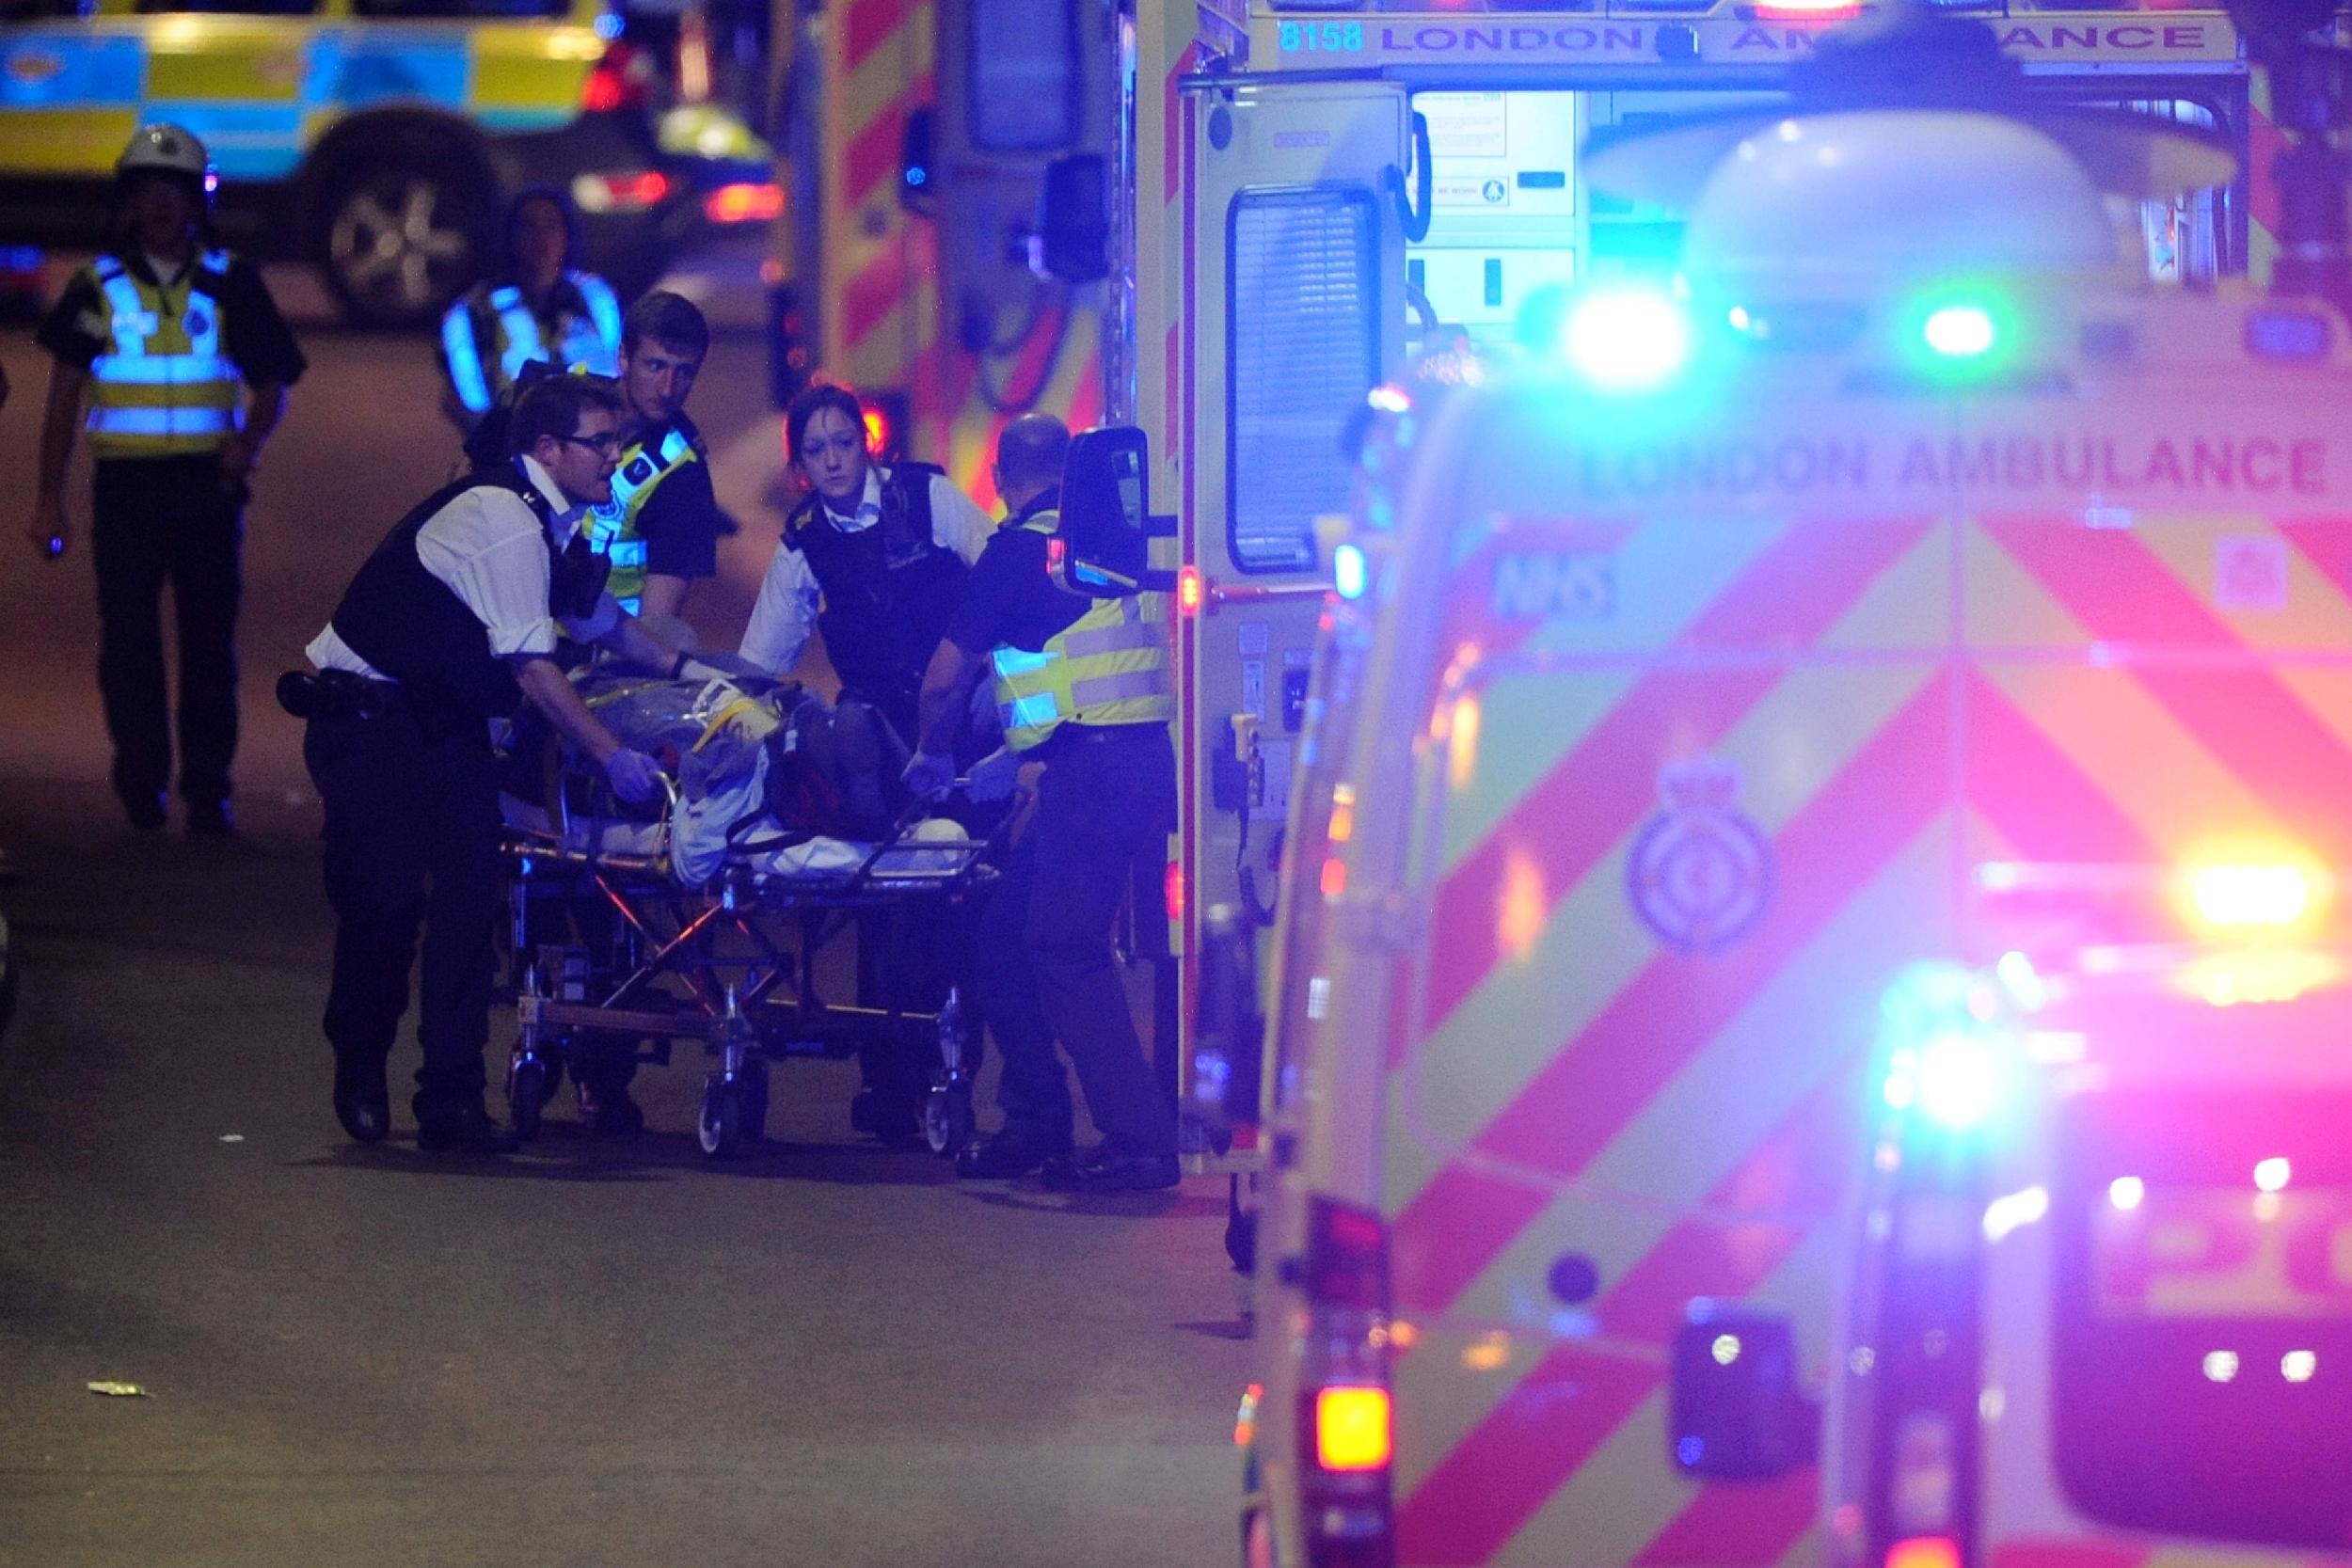 London Bridge Attack - NBC News